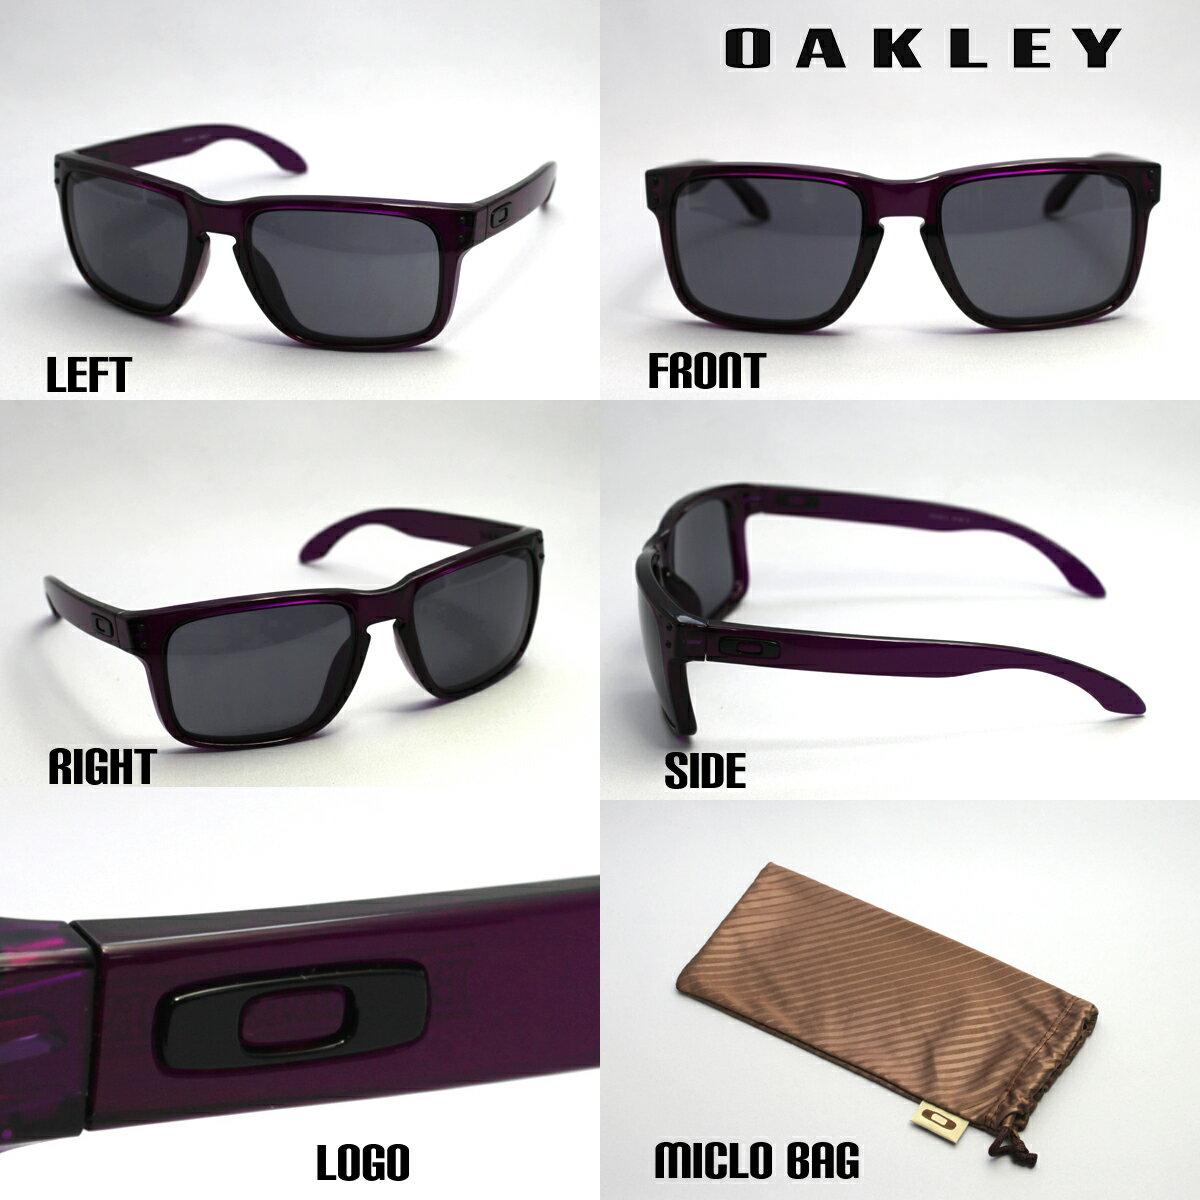 fa1cbf258de Oakley Sunglasses Buy Online Nz « Heritage Malta